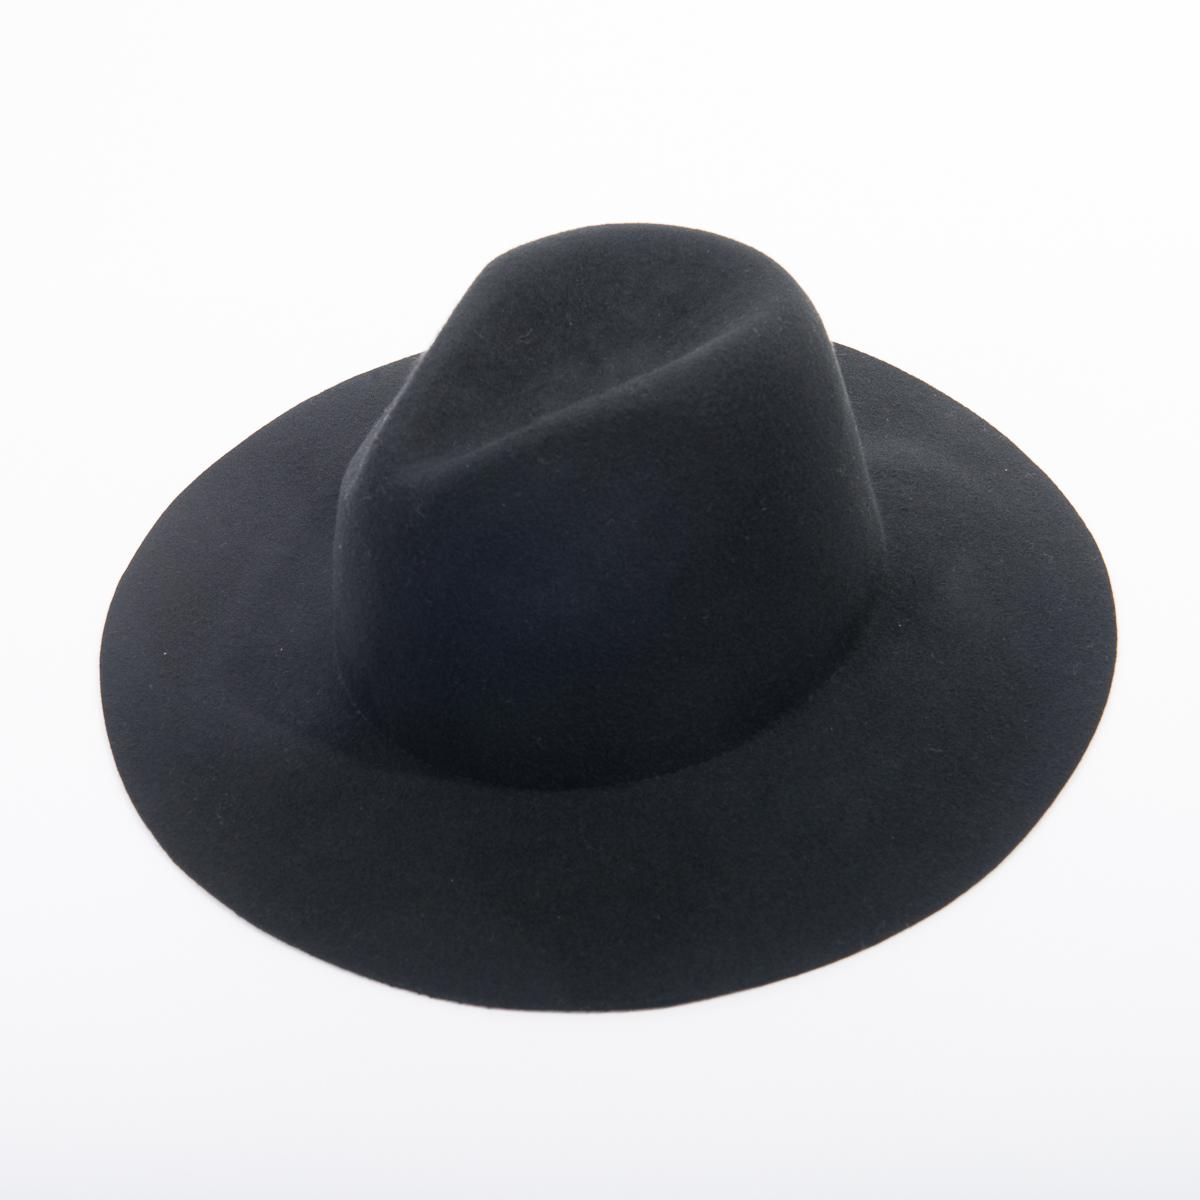 62fc63745404b3 Black Wide Brim Fedora Felt Plain Hats-W0166A-BLACK- Sun Yorkos | Zoria